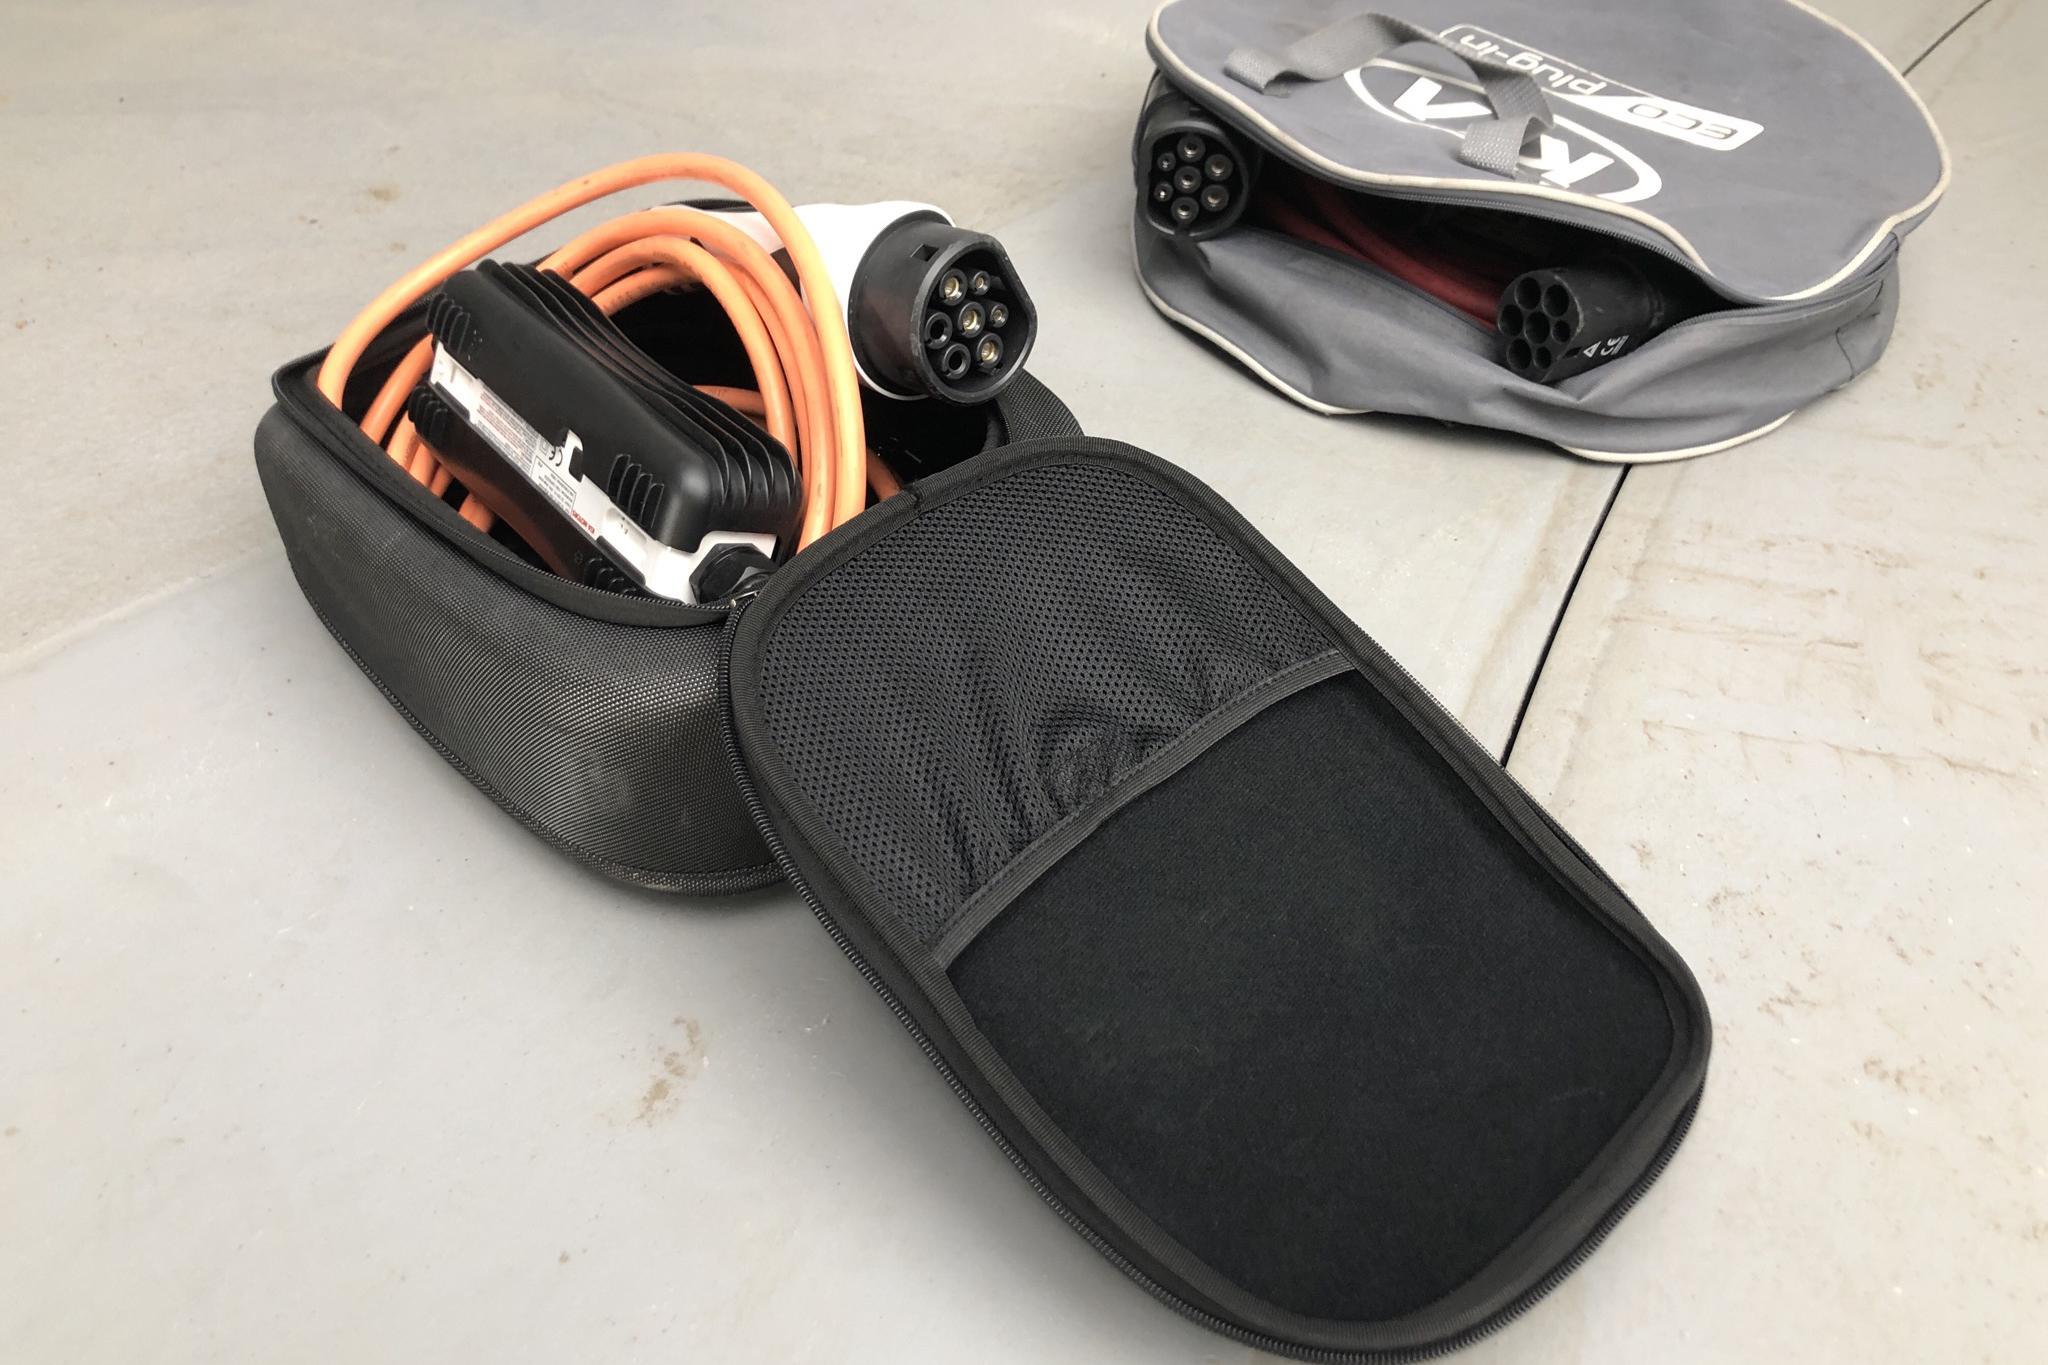 KIA Niro Plug-in Hybrid 1.6 (141hk) - 5 061 mil - Automat - vit - 2018